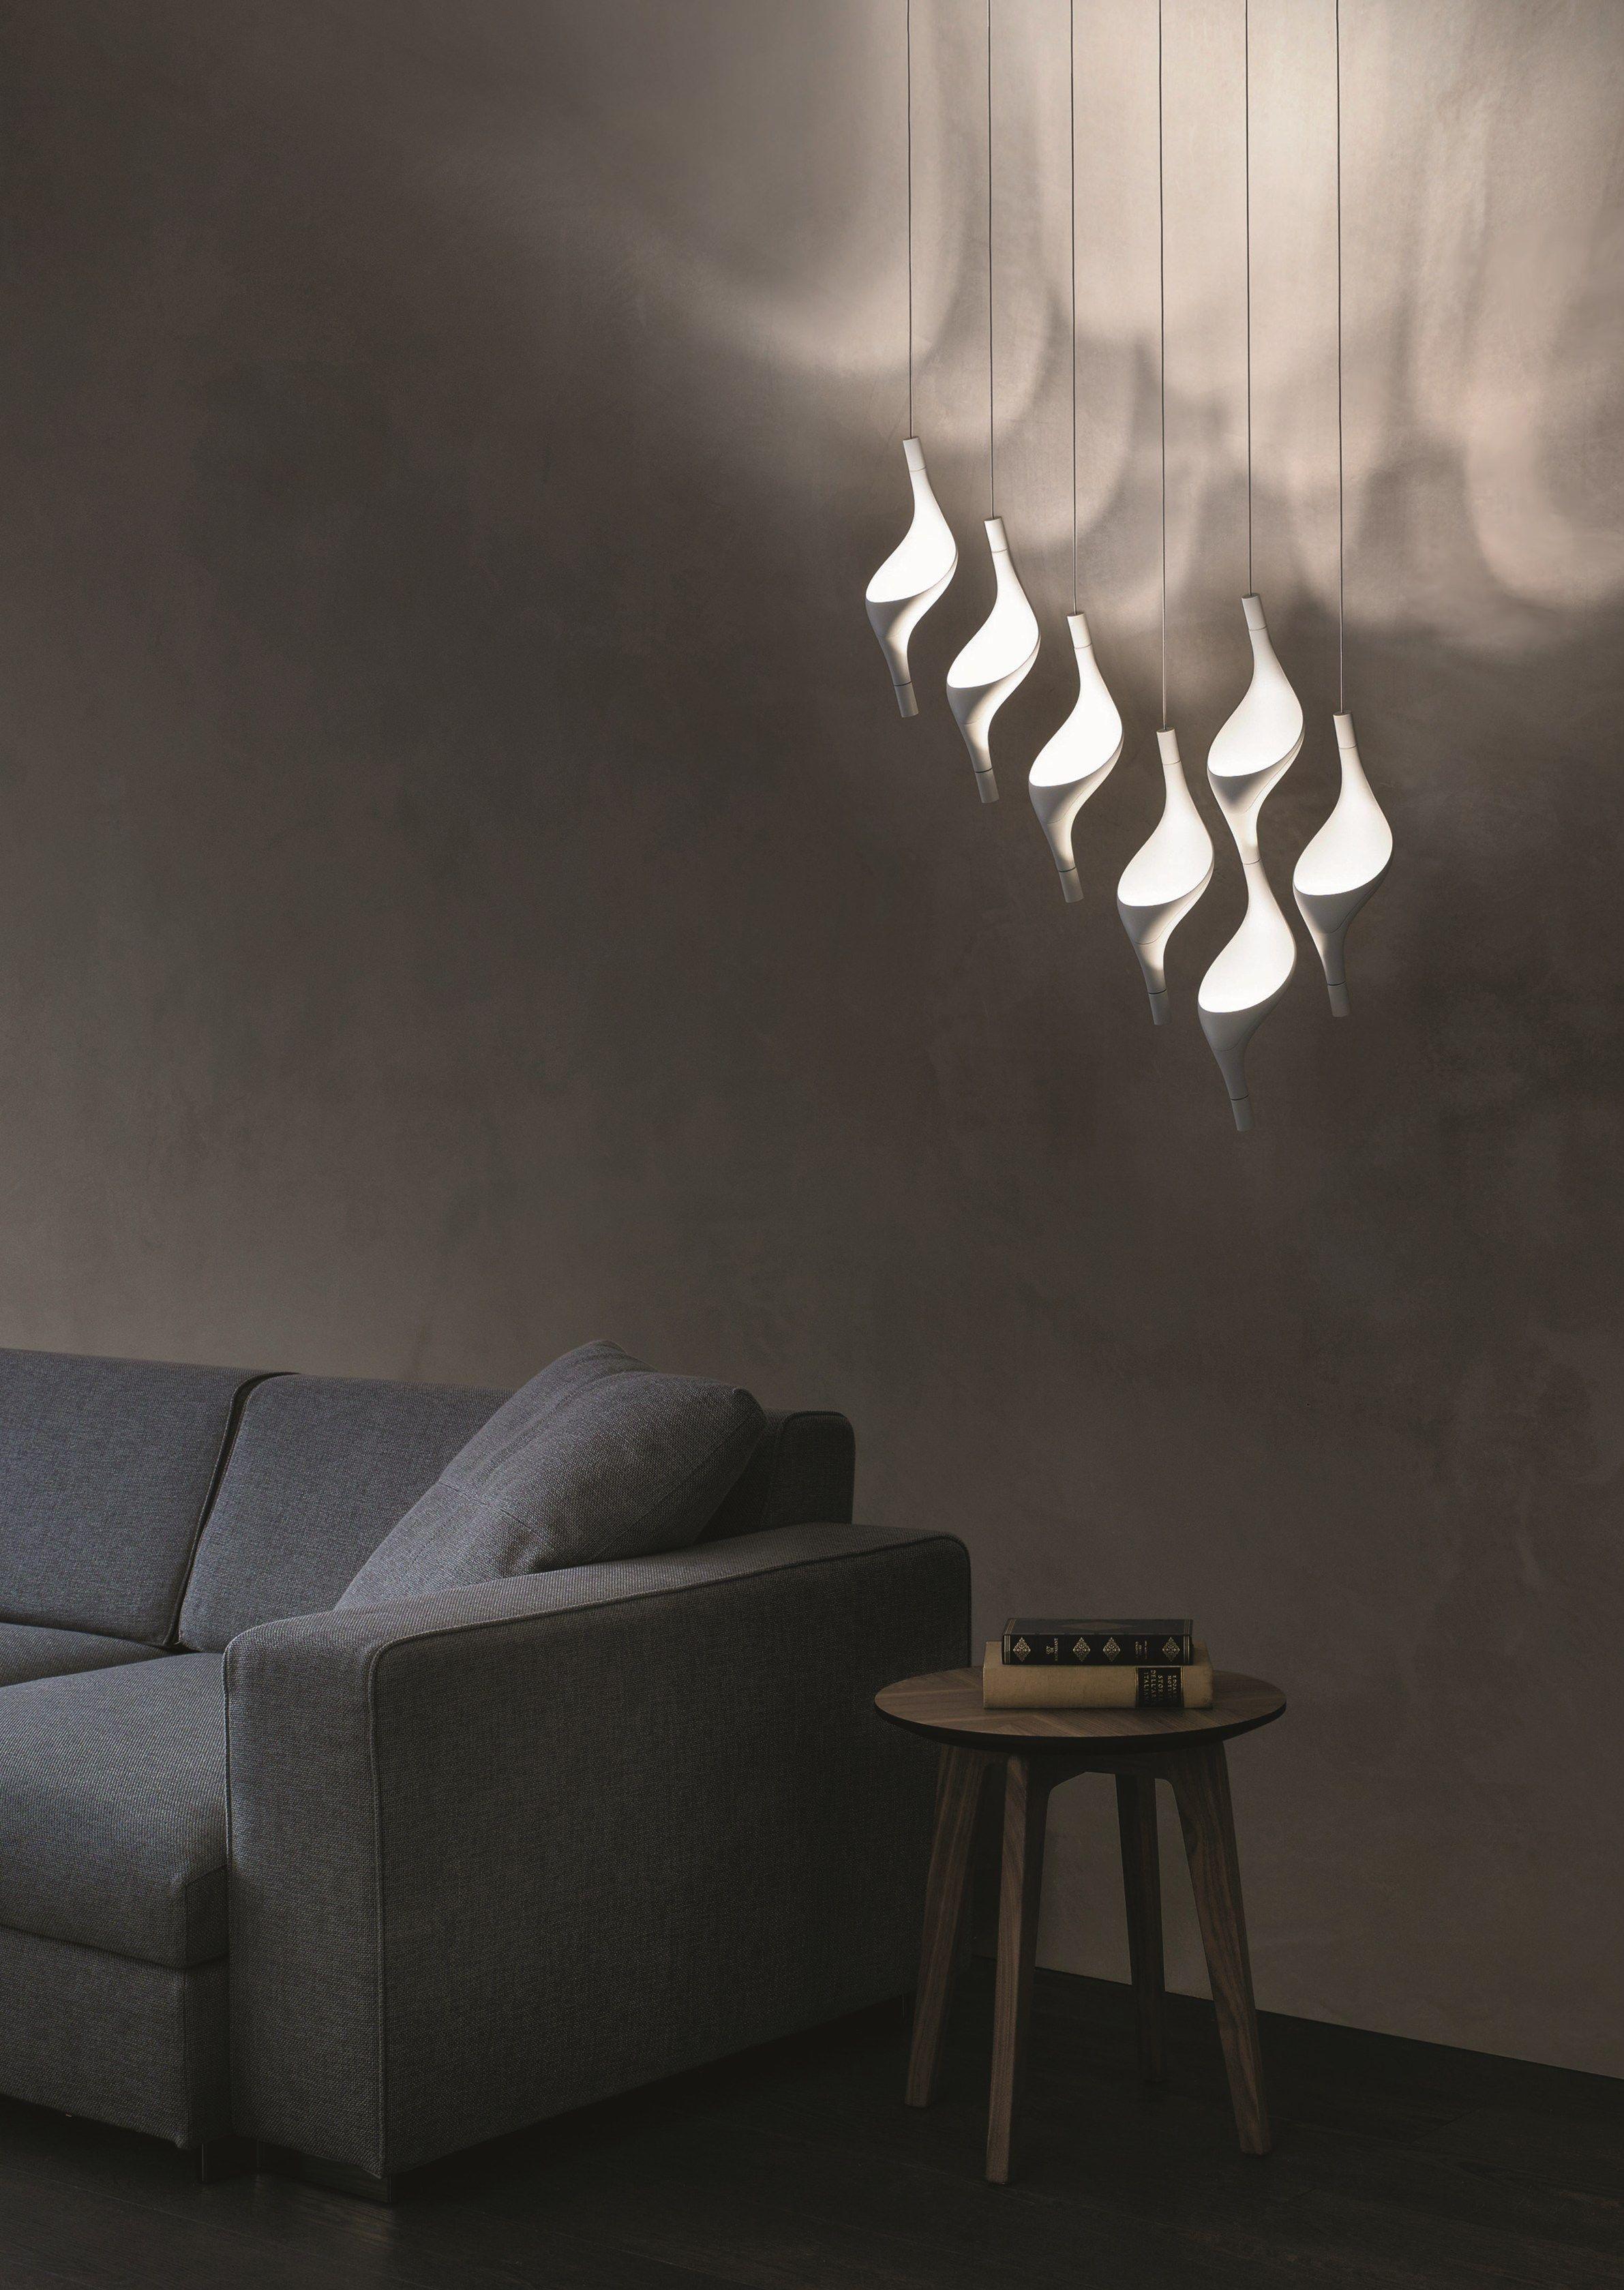 led pendant lamp acqua by cini nils design luta bettonica. Black Bedroom Furniture Sets. Home Design Ideas